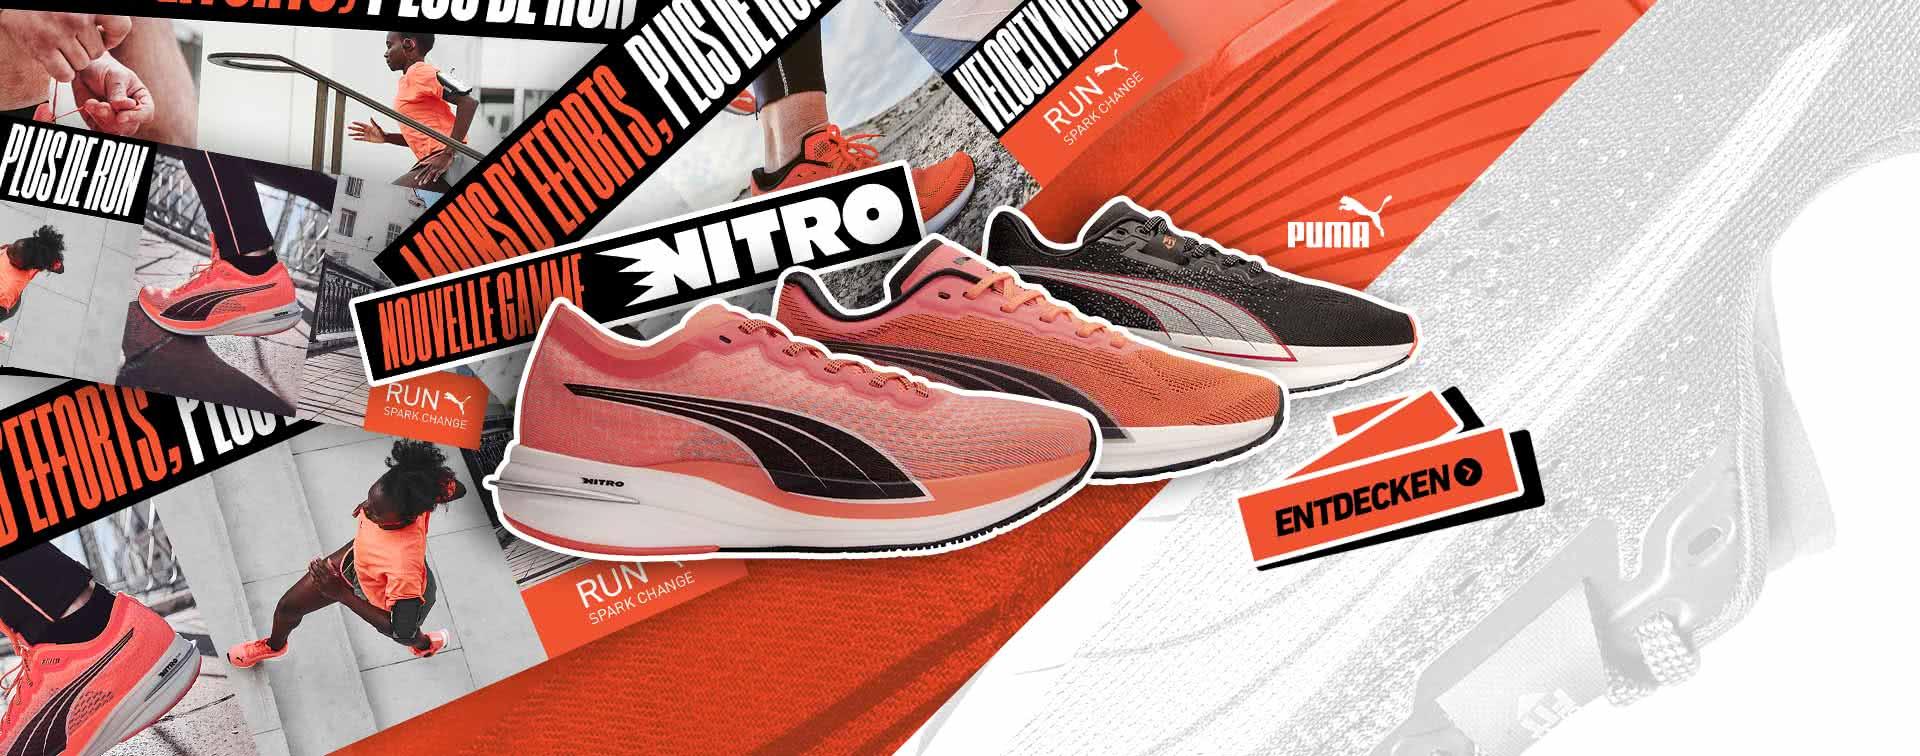 Neue Puma Nitro Reihe